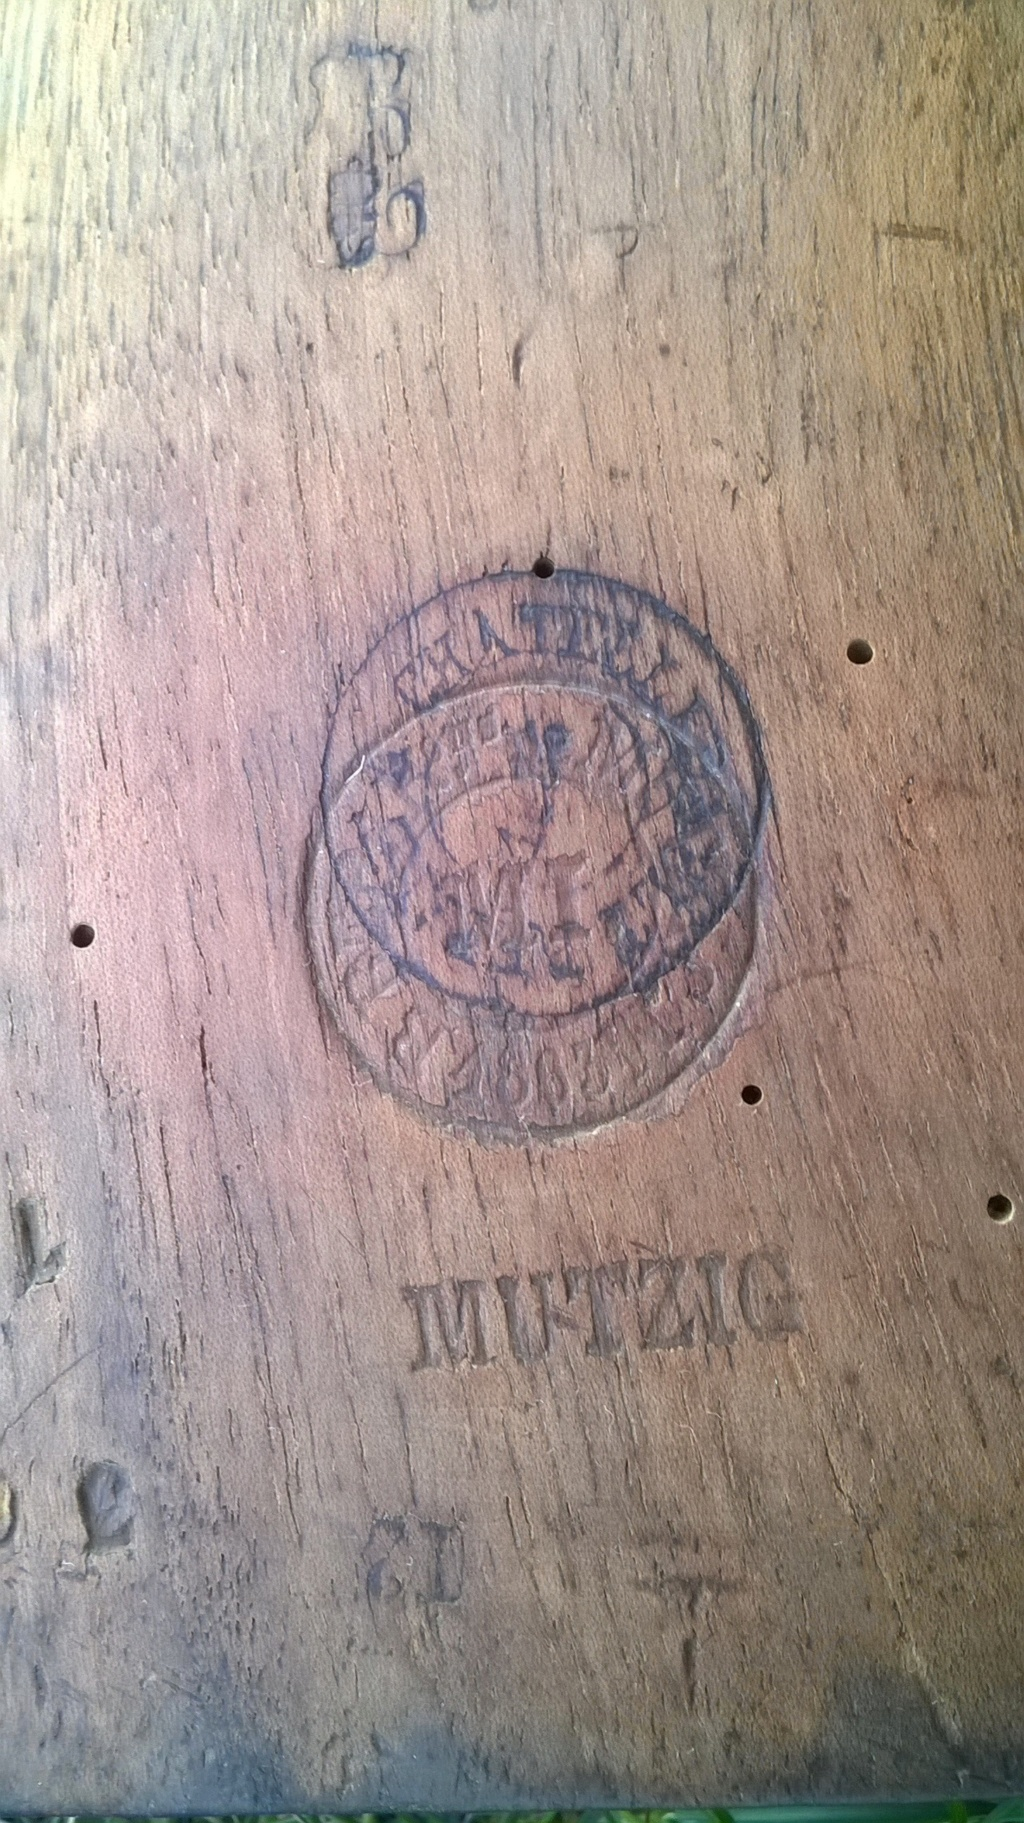 Fusil 1822 T Bis sorti de grenier Wp_20132